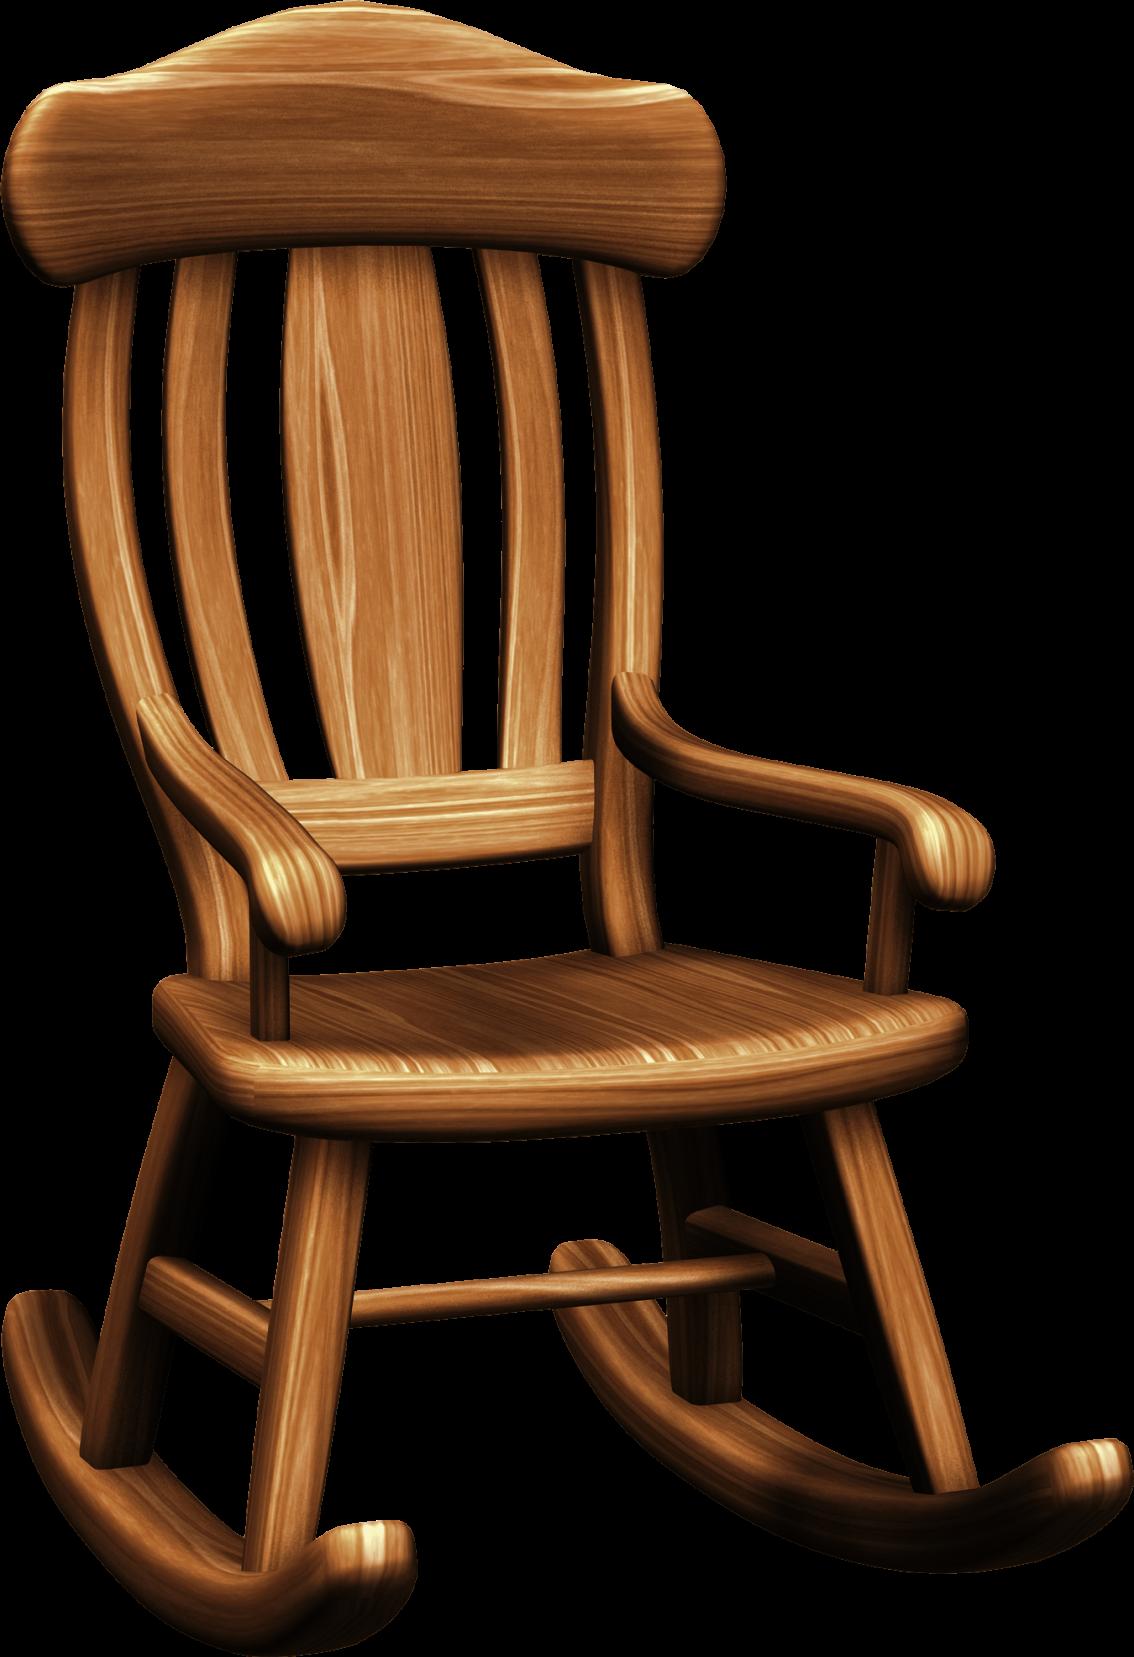 clipart chair empty chair